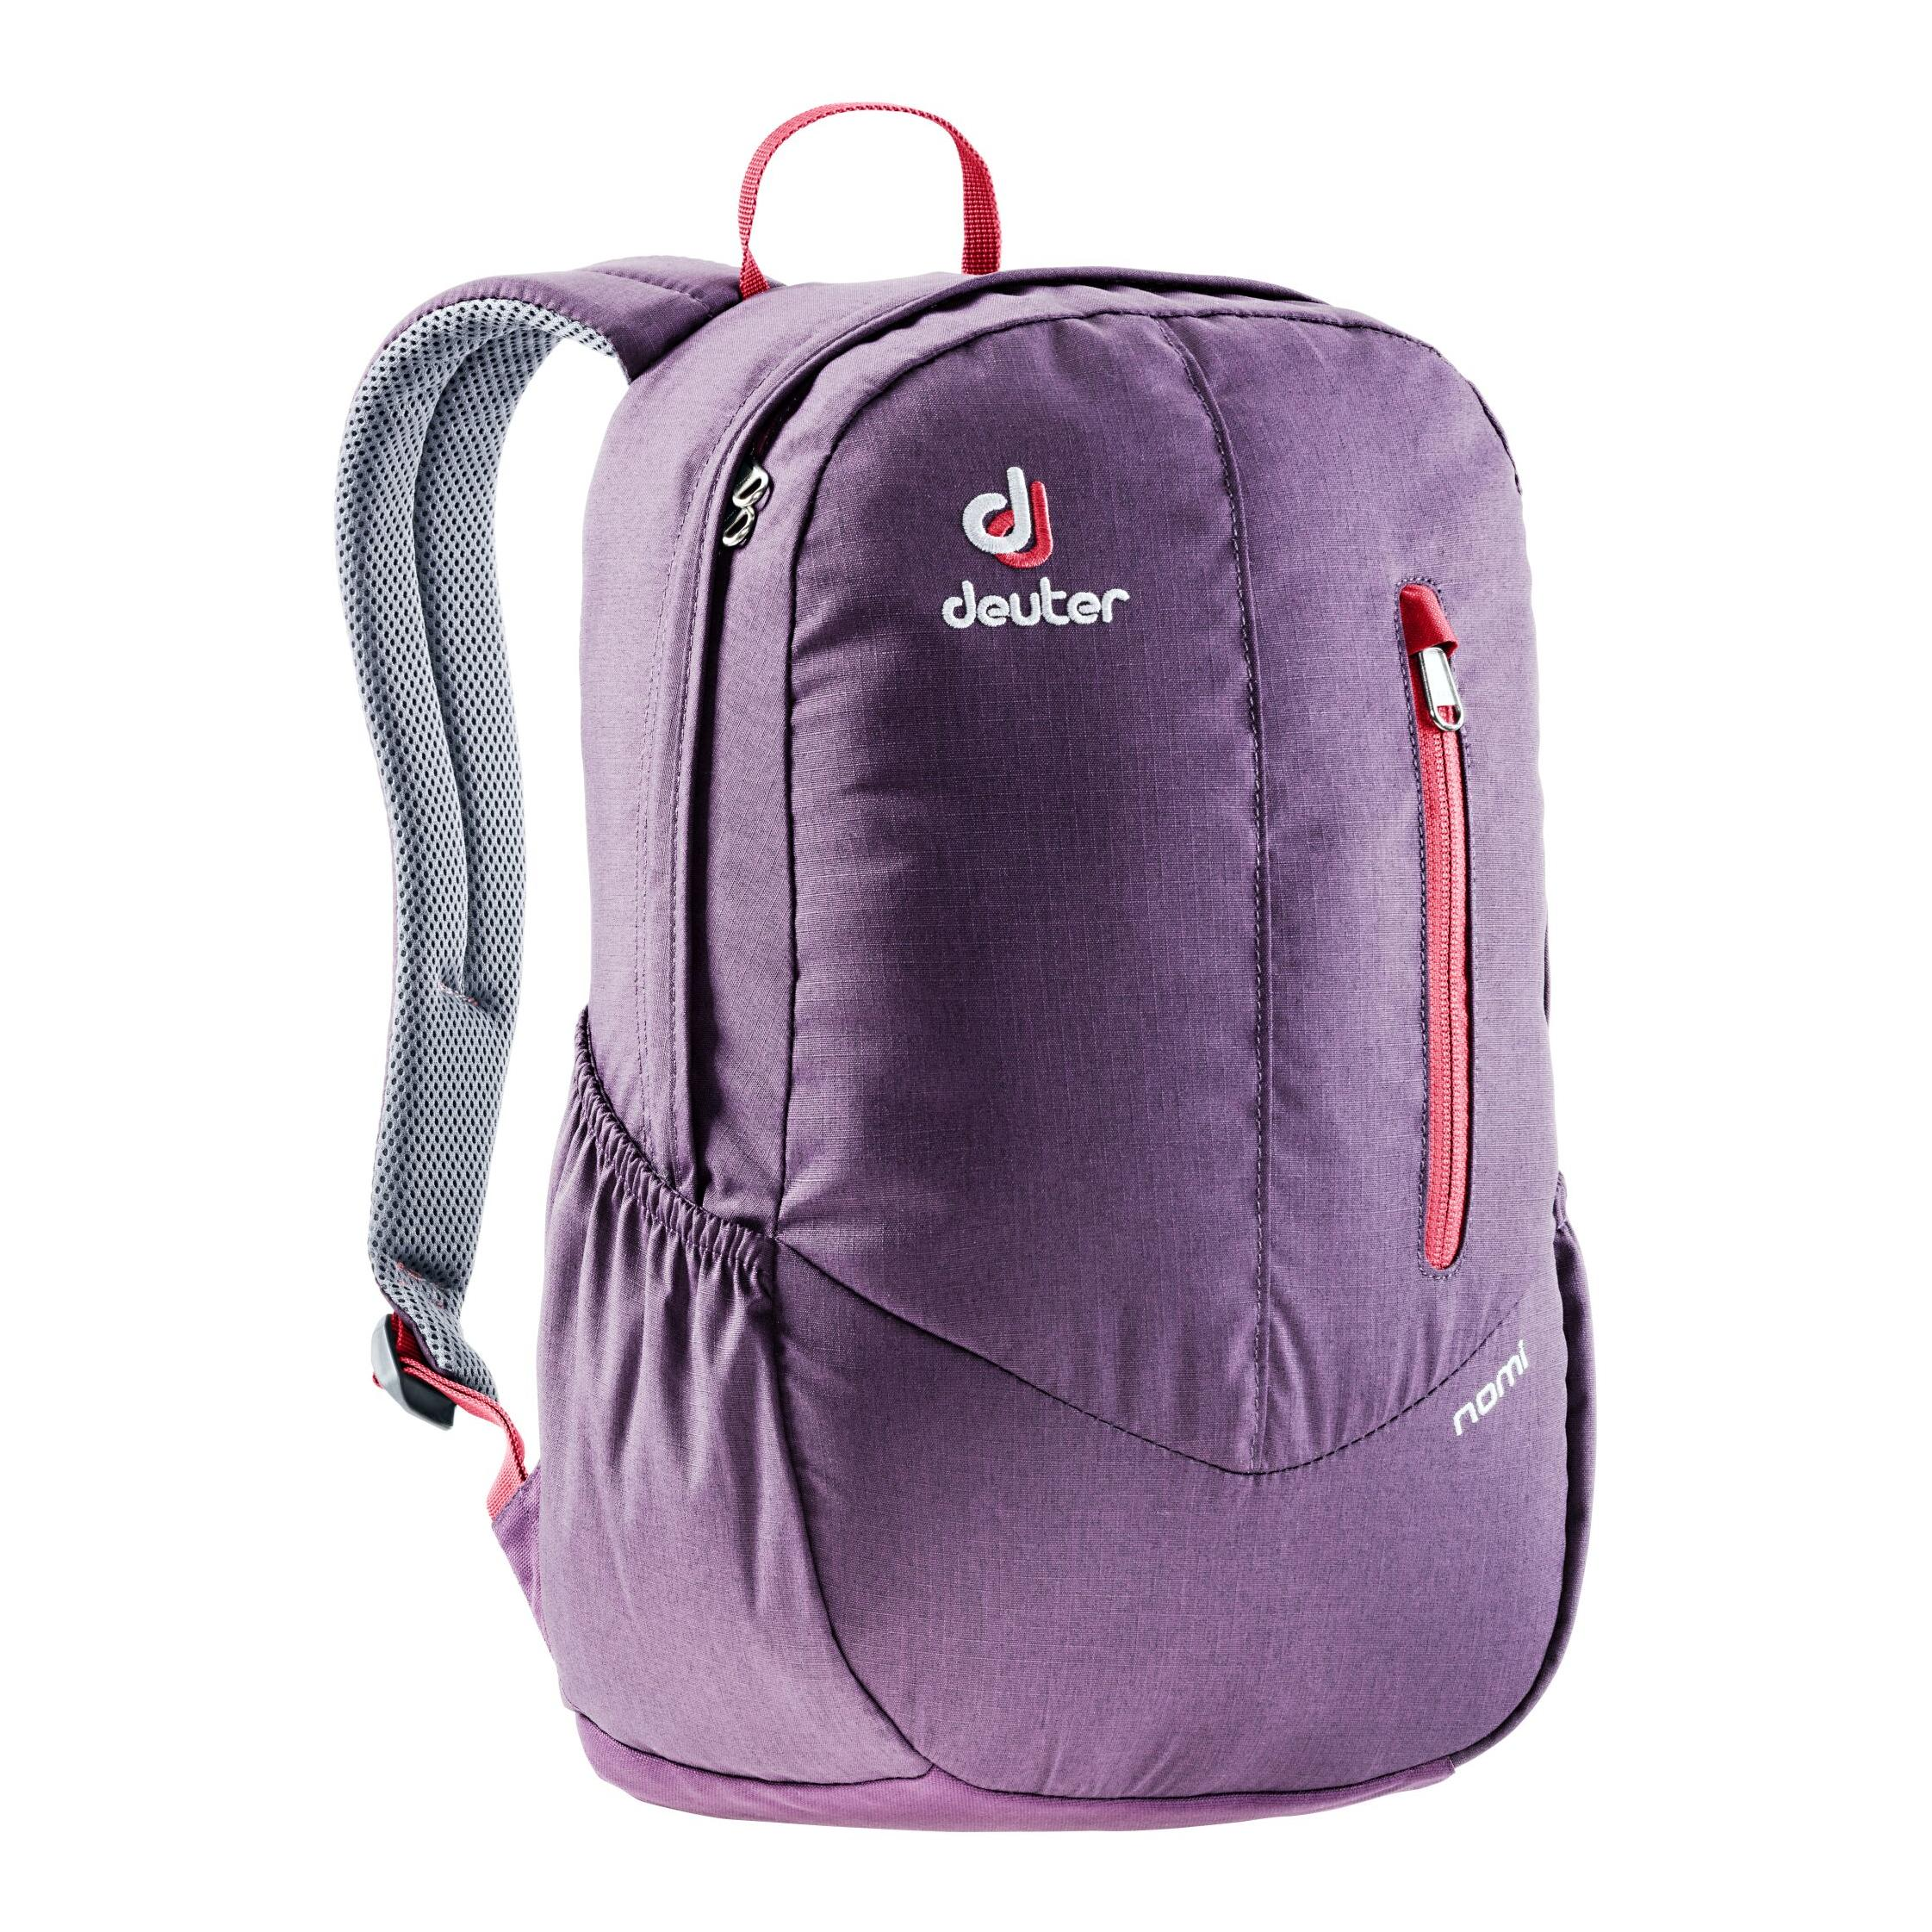 Randonnee Randonne Couteaux Multi Deuter Tritoo Sport Tas Touring Anti Air Restrap Saddle Bag Dry Made In Uk Black L Nomi Violet